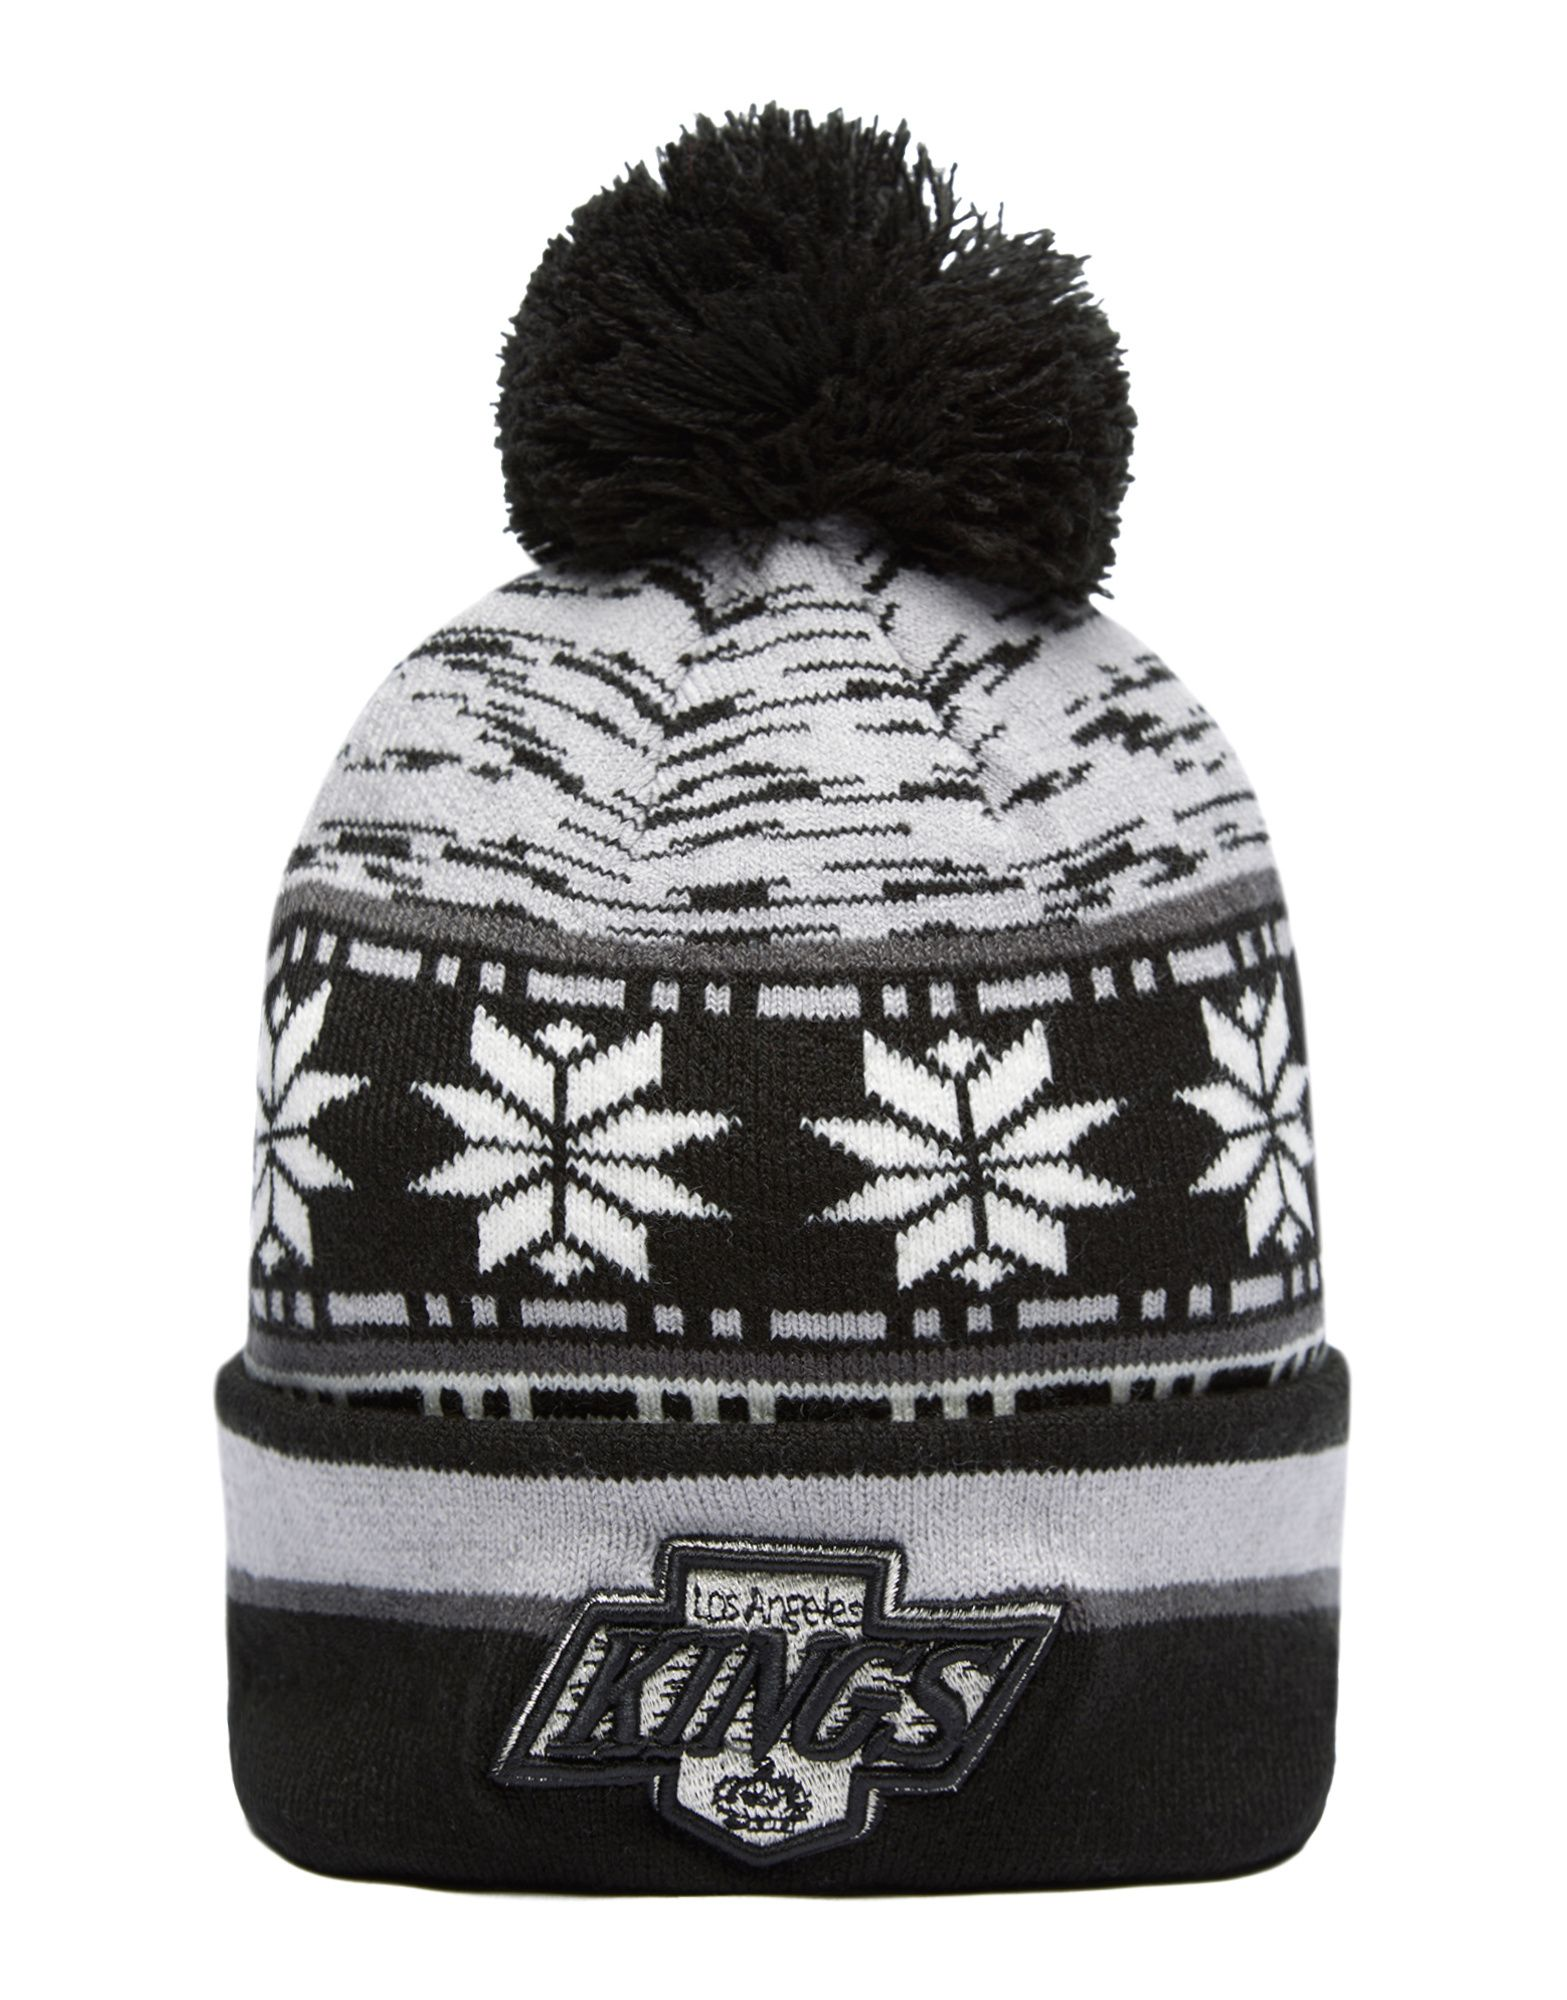 New Era NHL L.A Kings Blizzard Bobble Hat